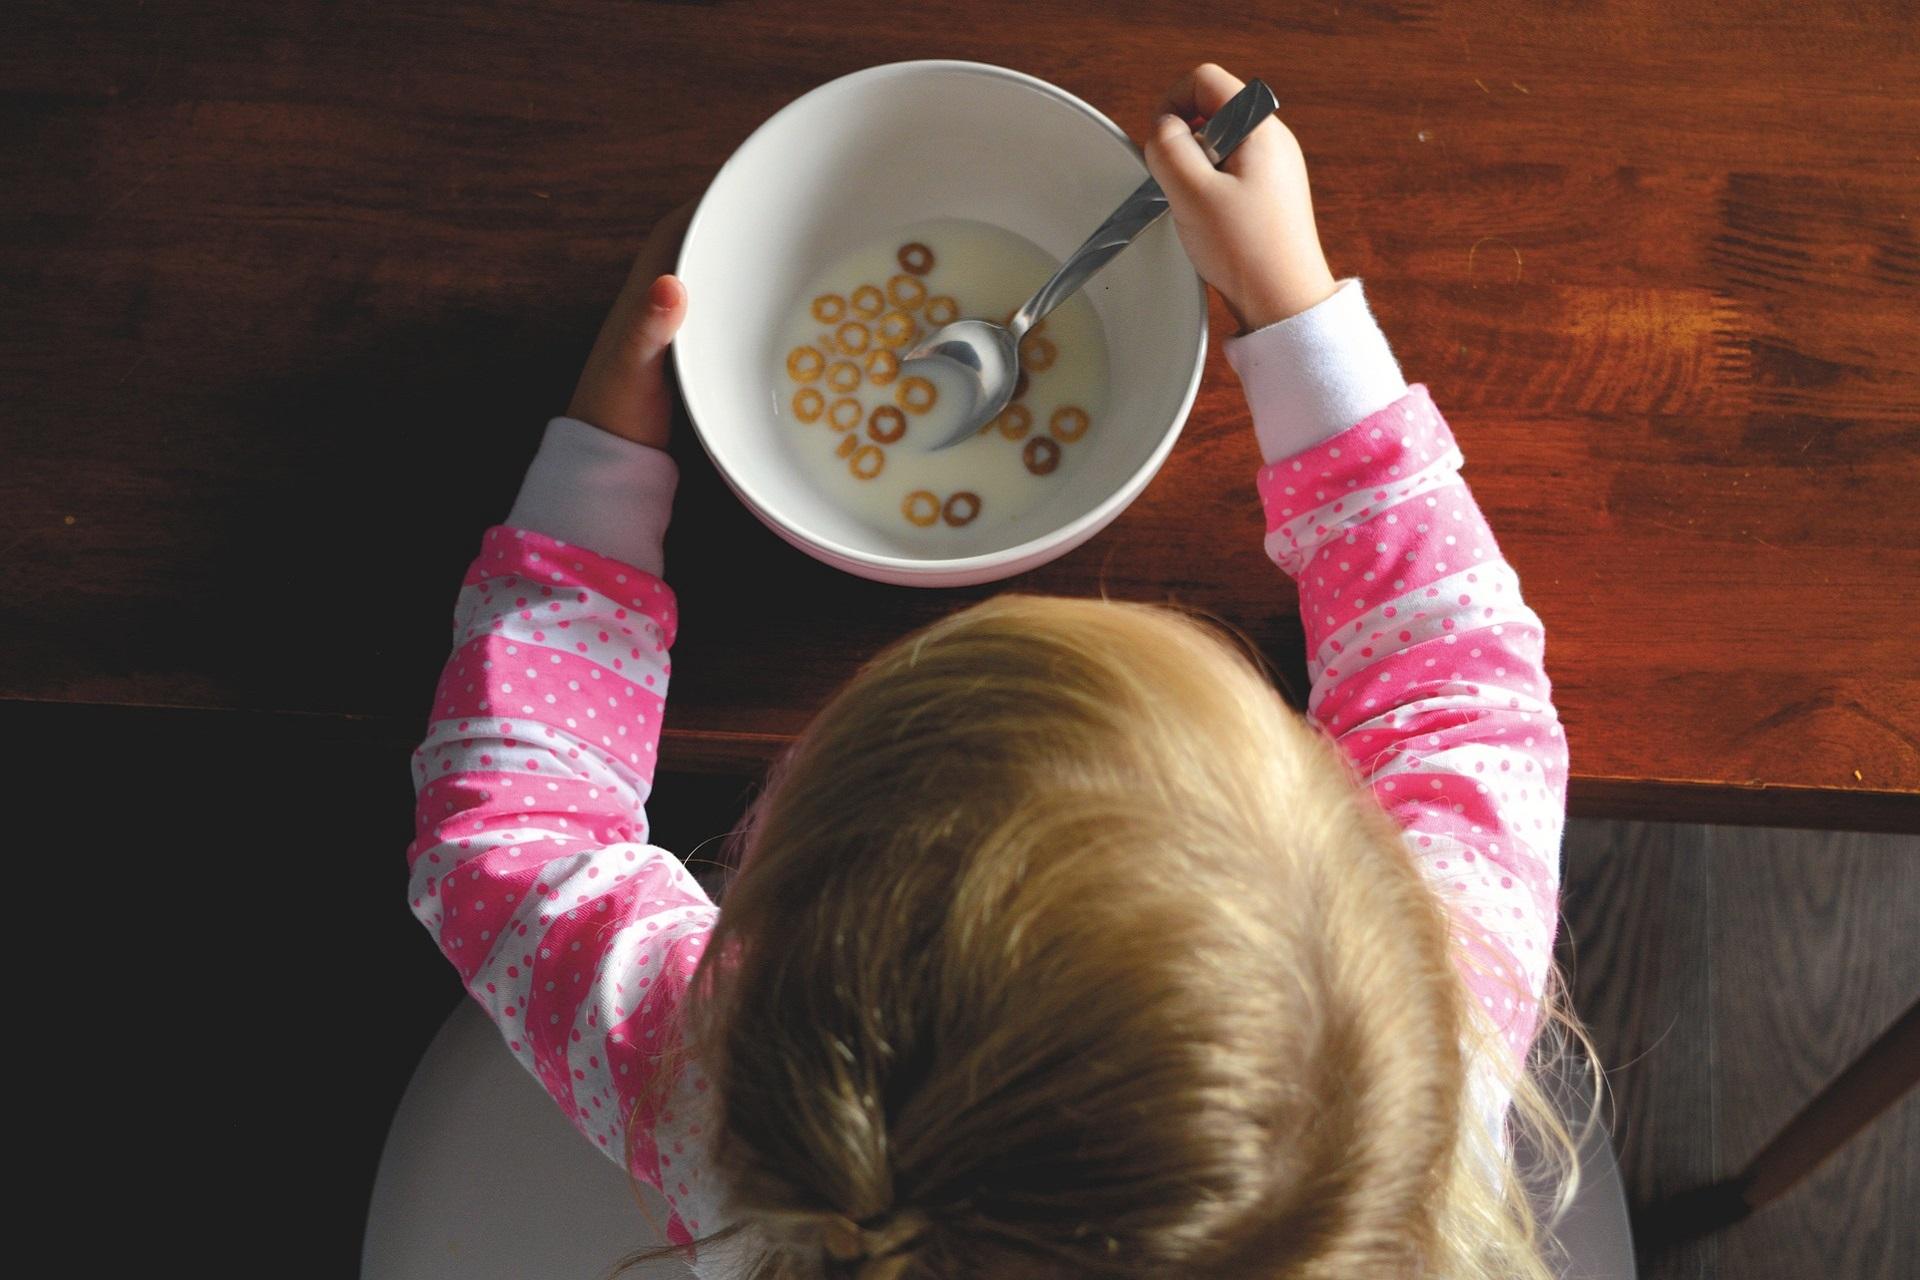 Kinder und vegane Ernährung - Natural Energizer